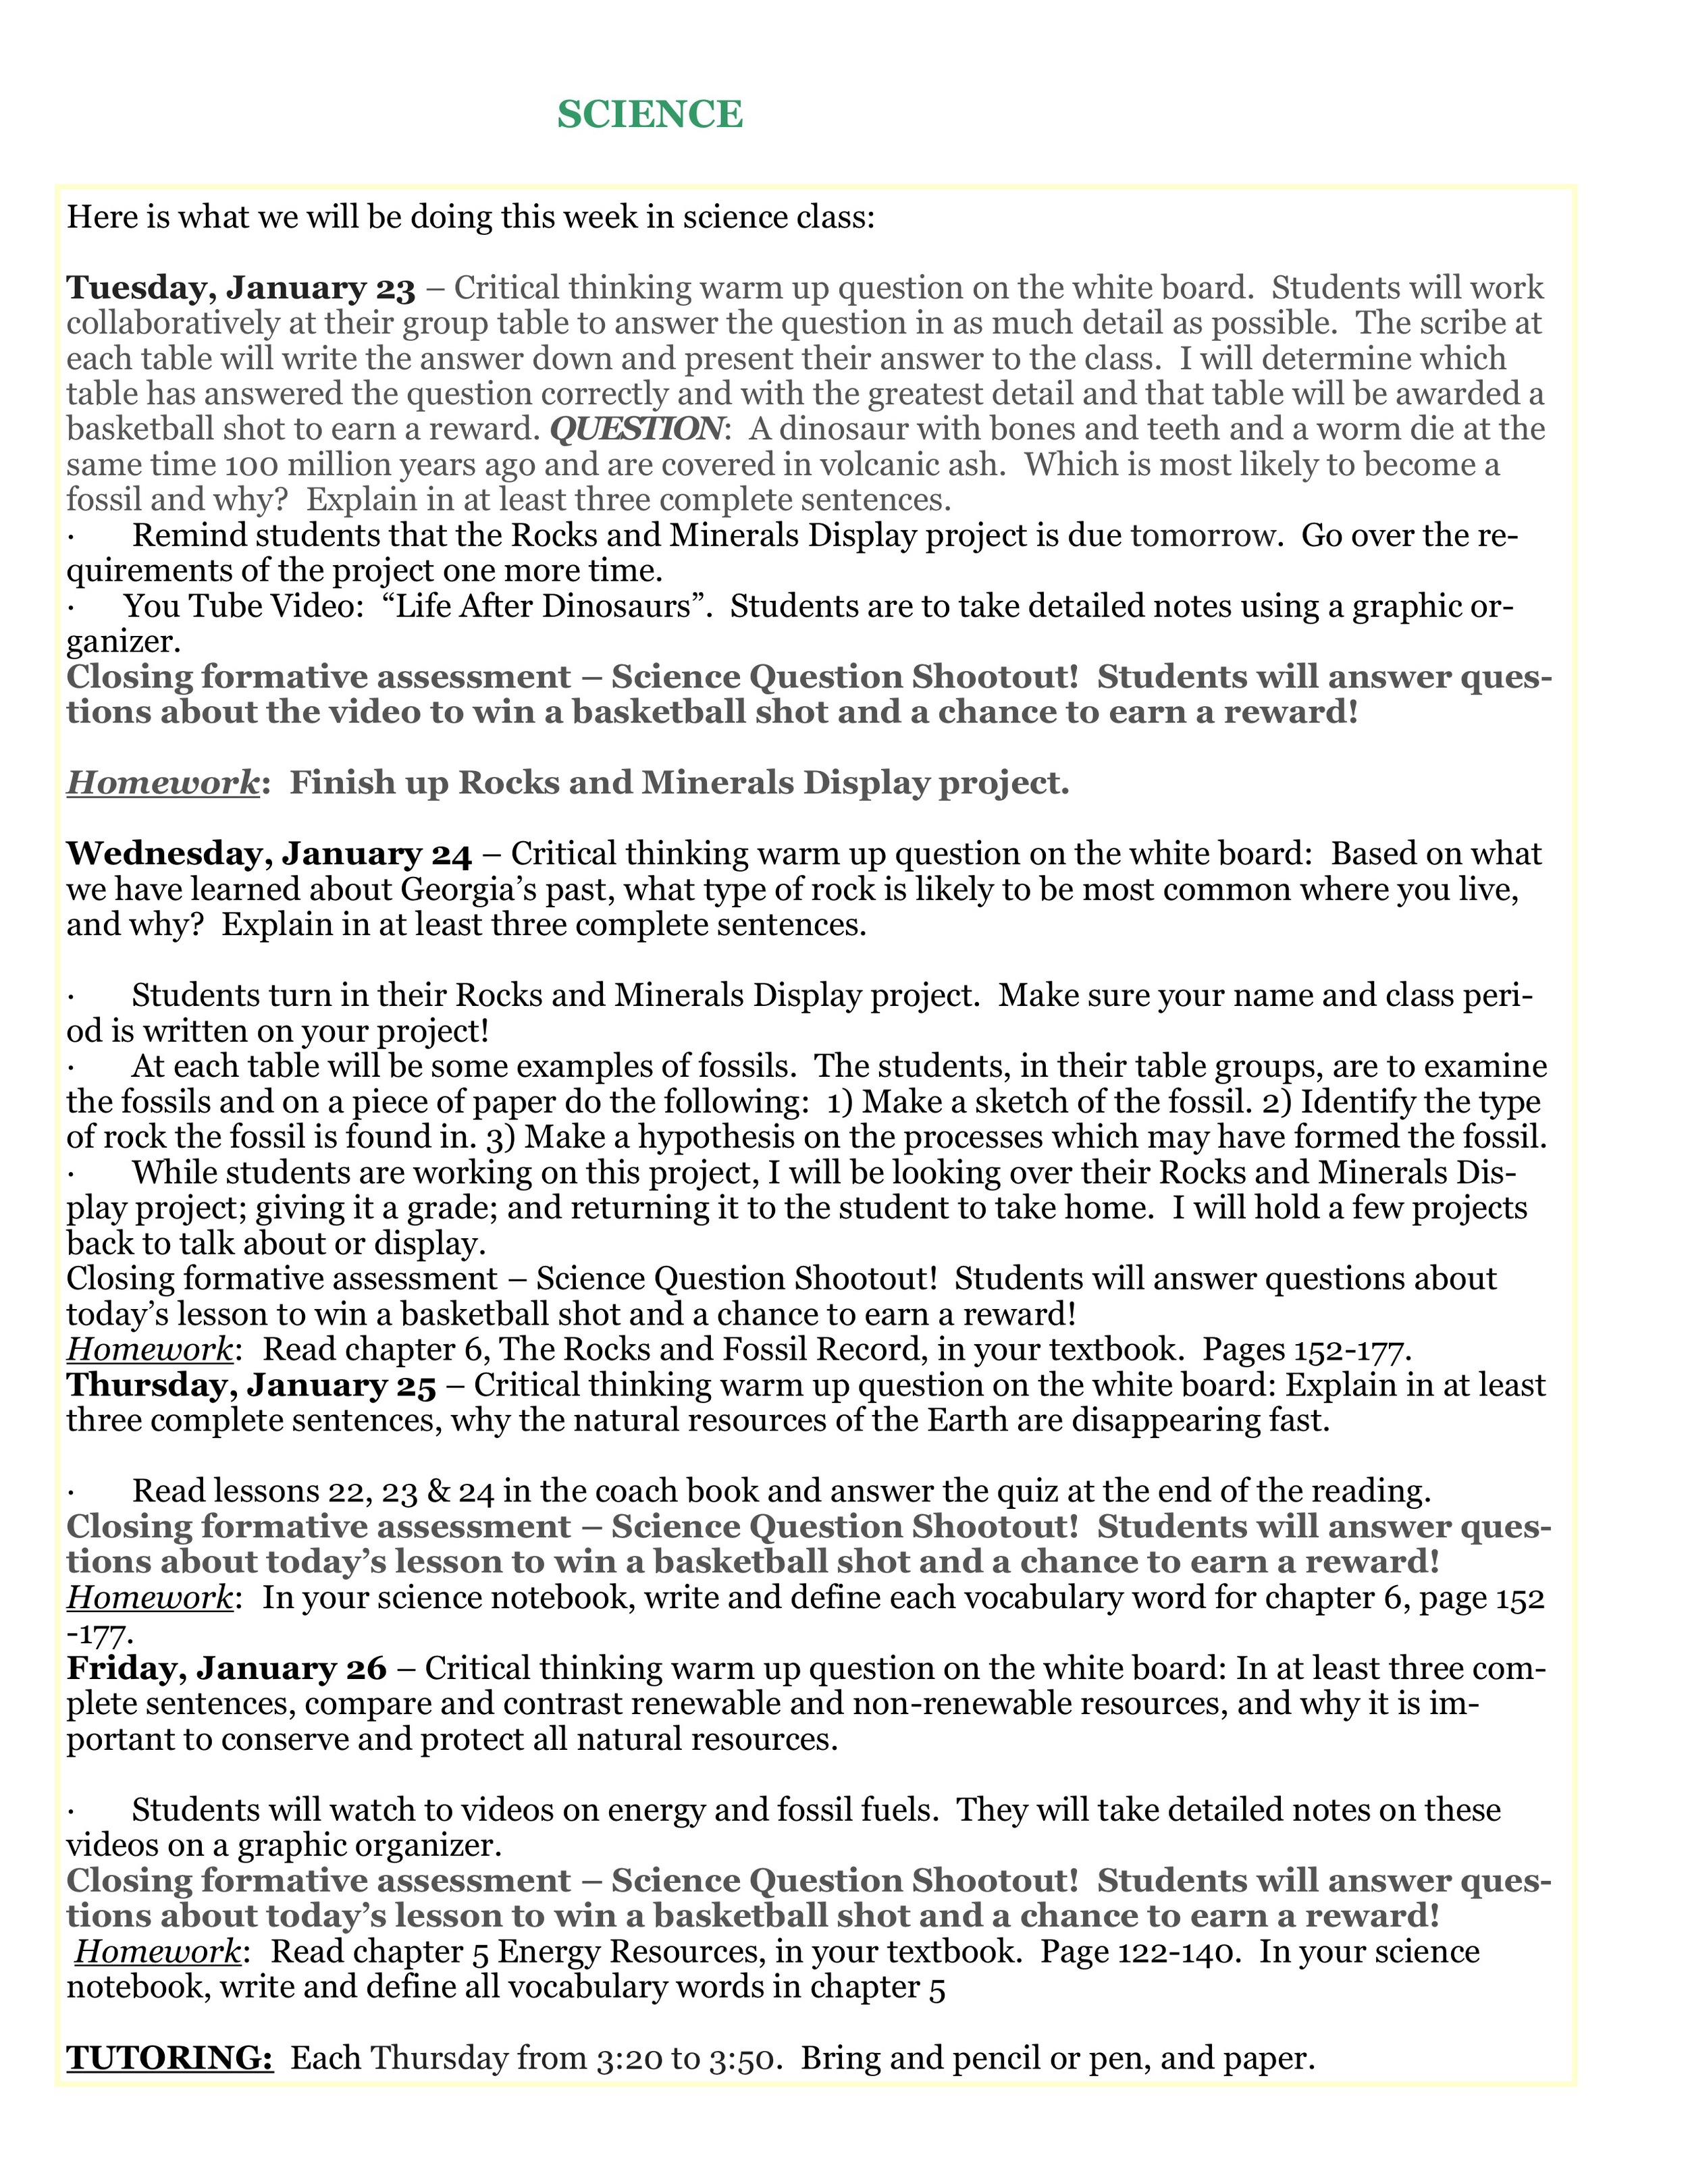 Newsletter Image6th grade January 20-23 4.jpeg